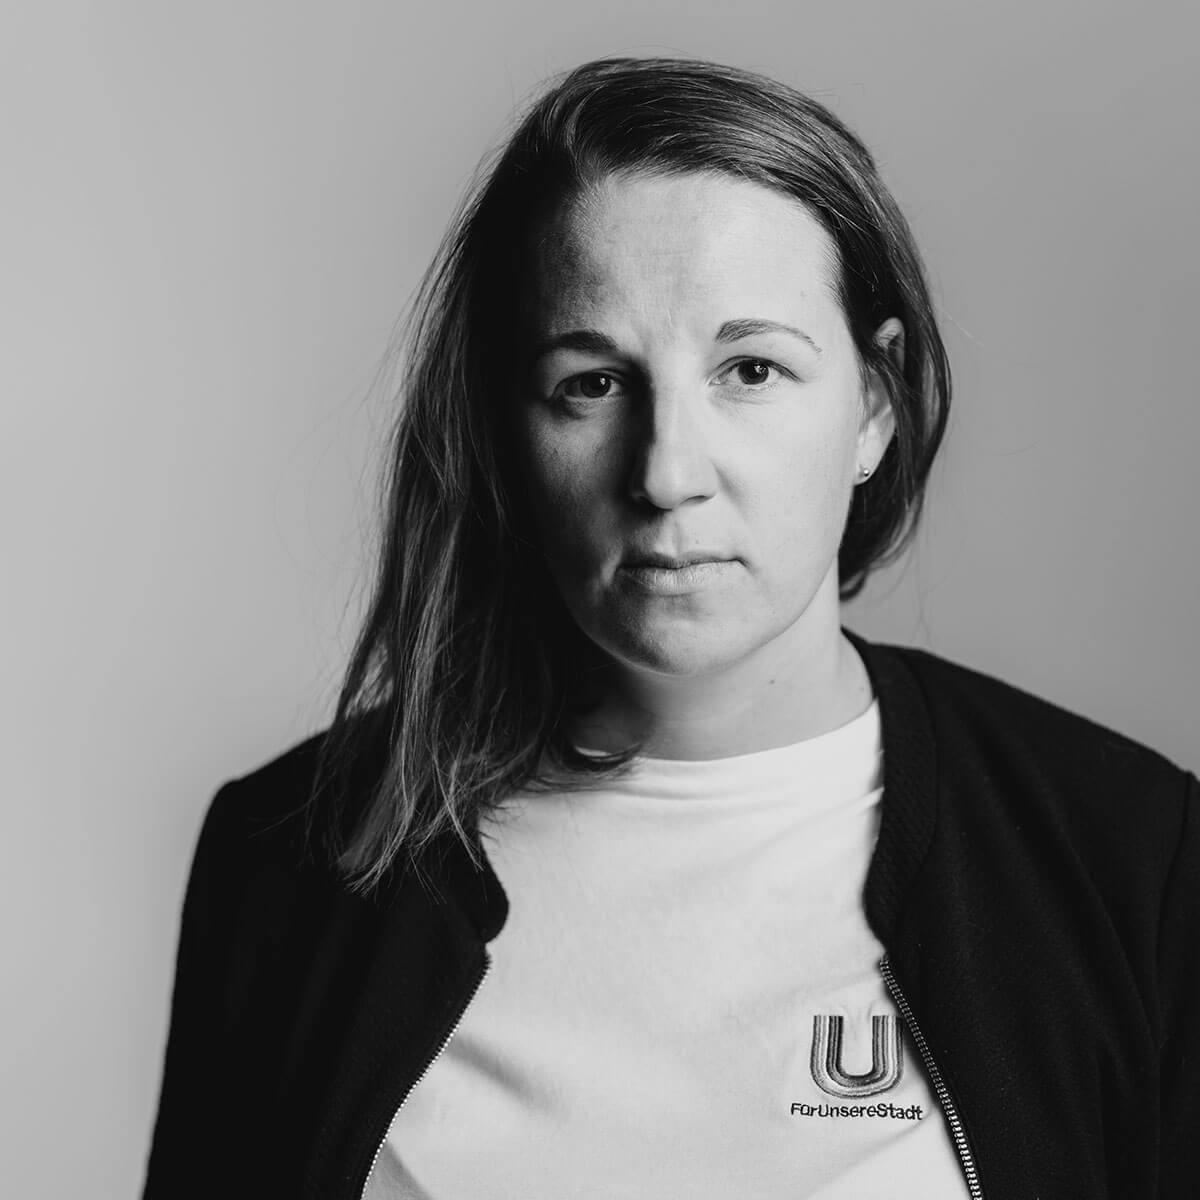 Lena Wessel